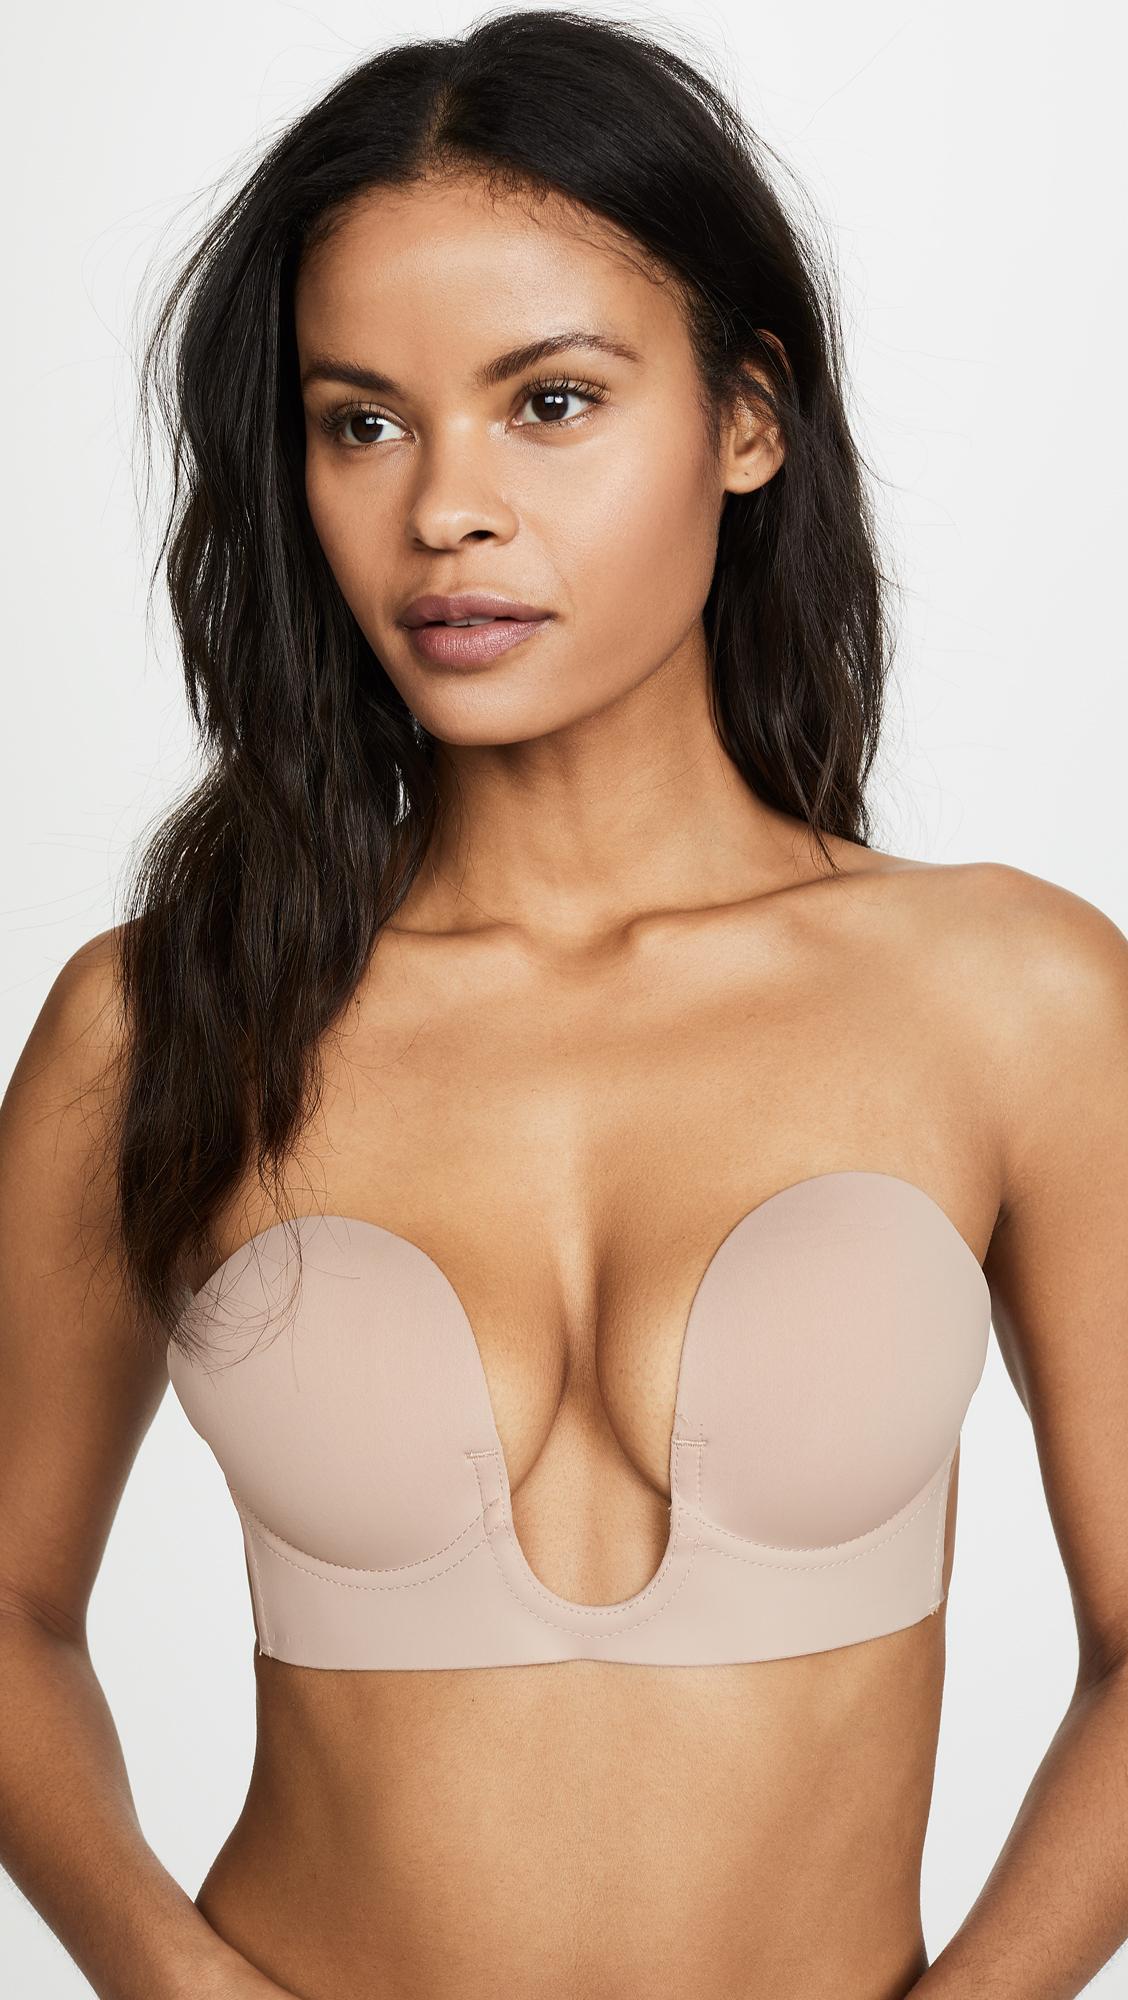 fe82e68a25053 Fashion Forms. Women s U Plunge Backless Strapless Bra